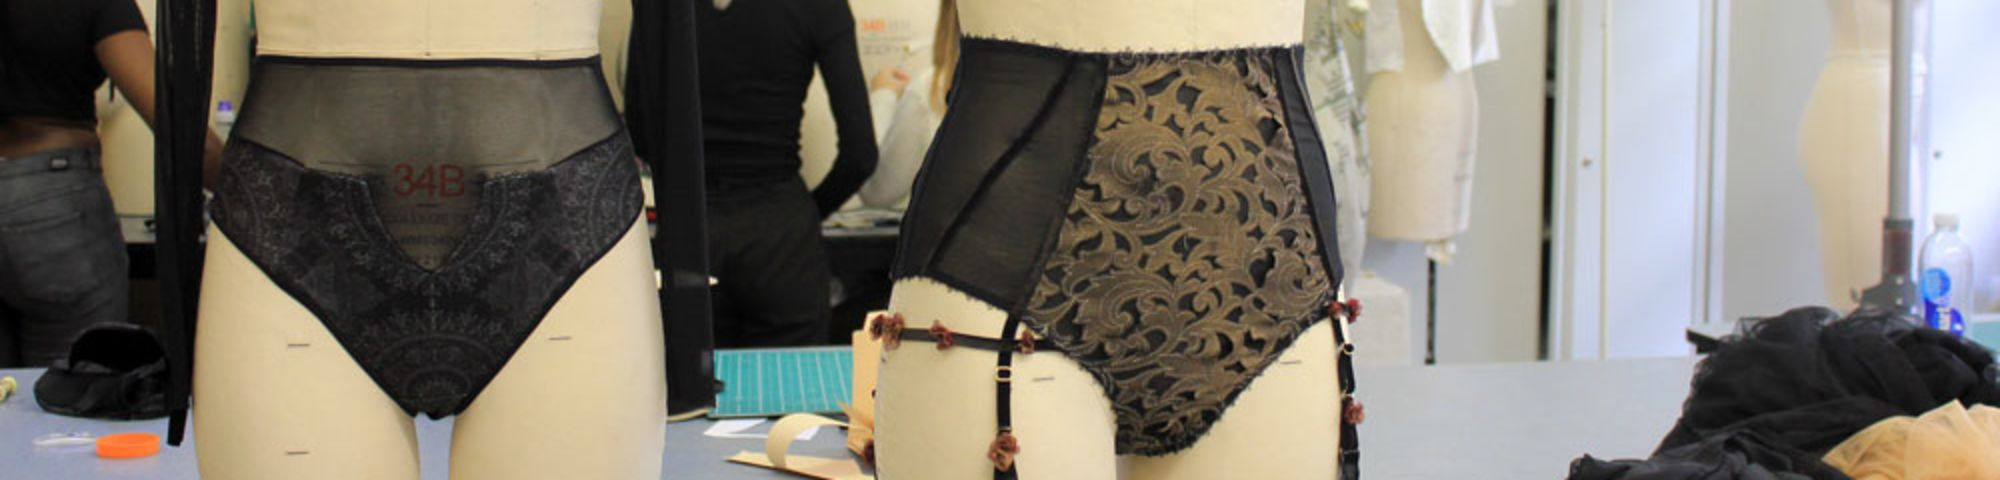 BA Fashion Contour students' shortlisted work